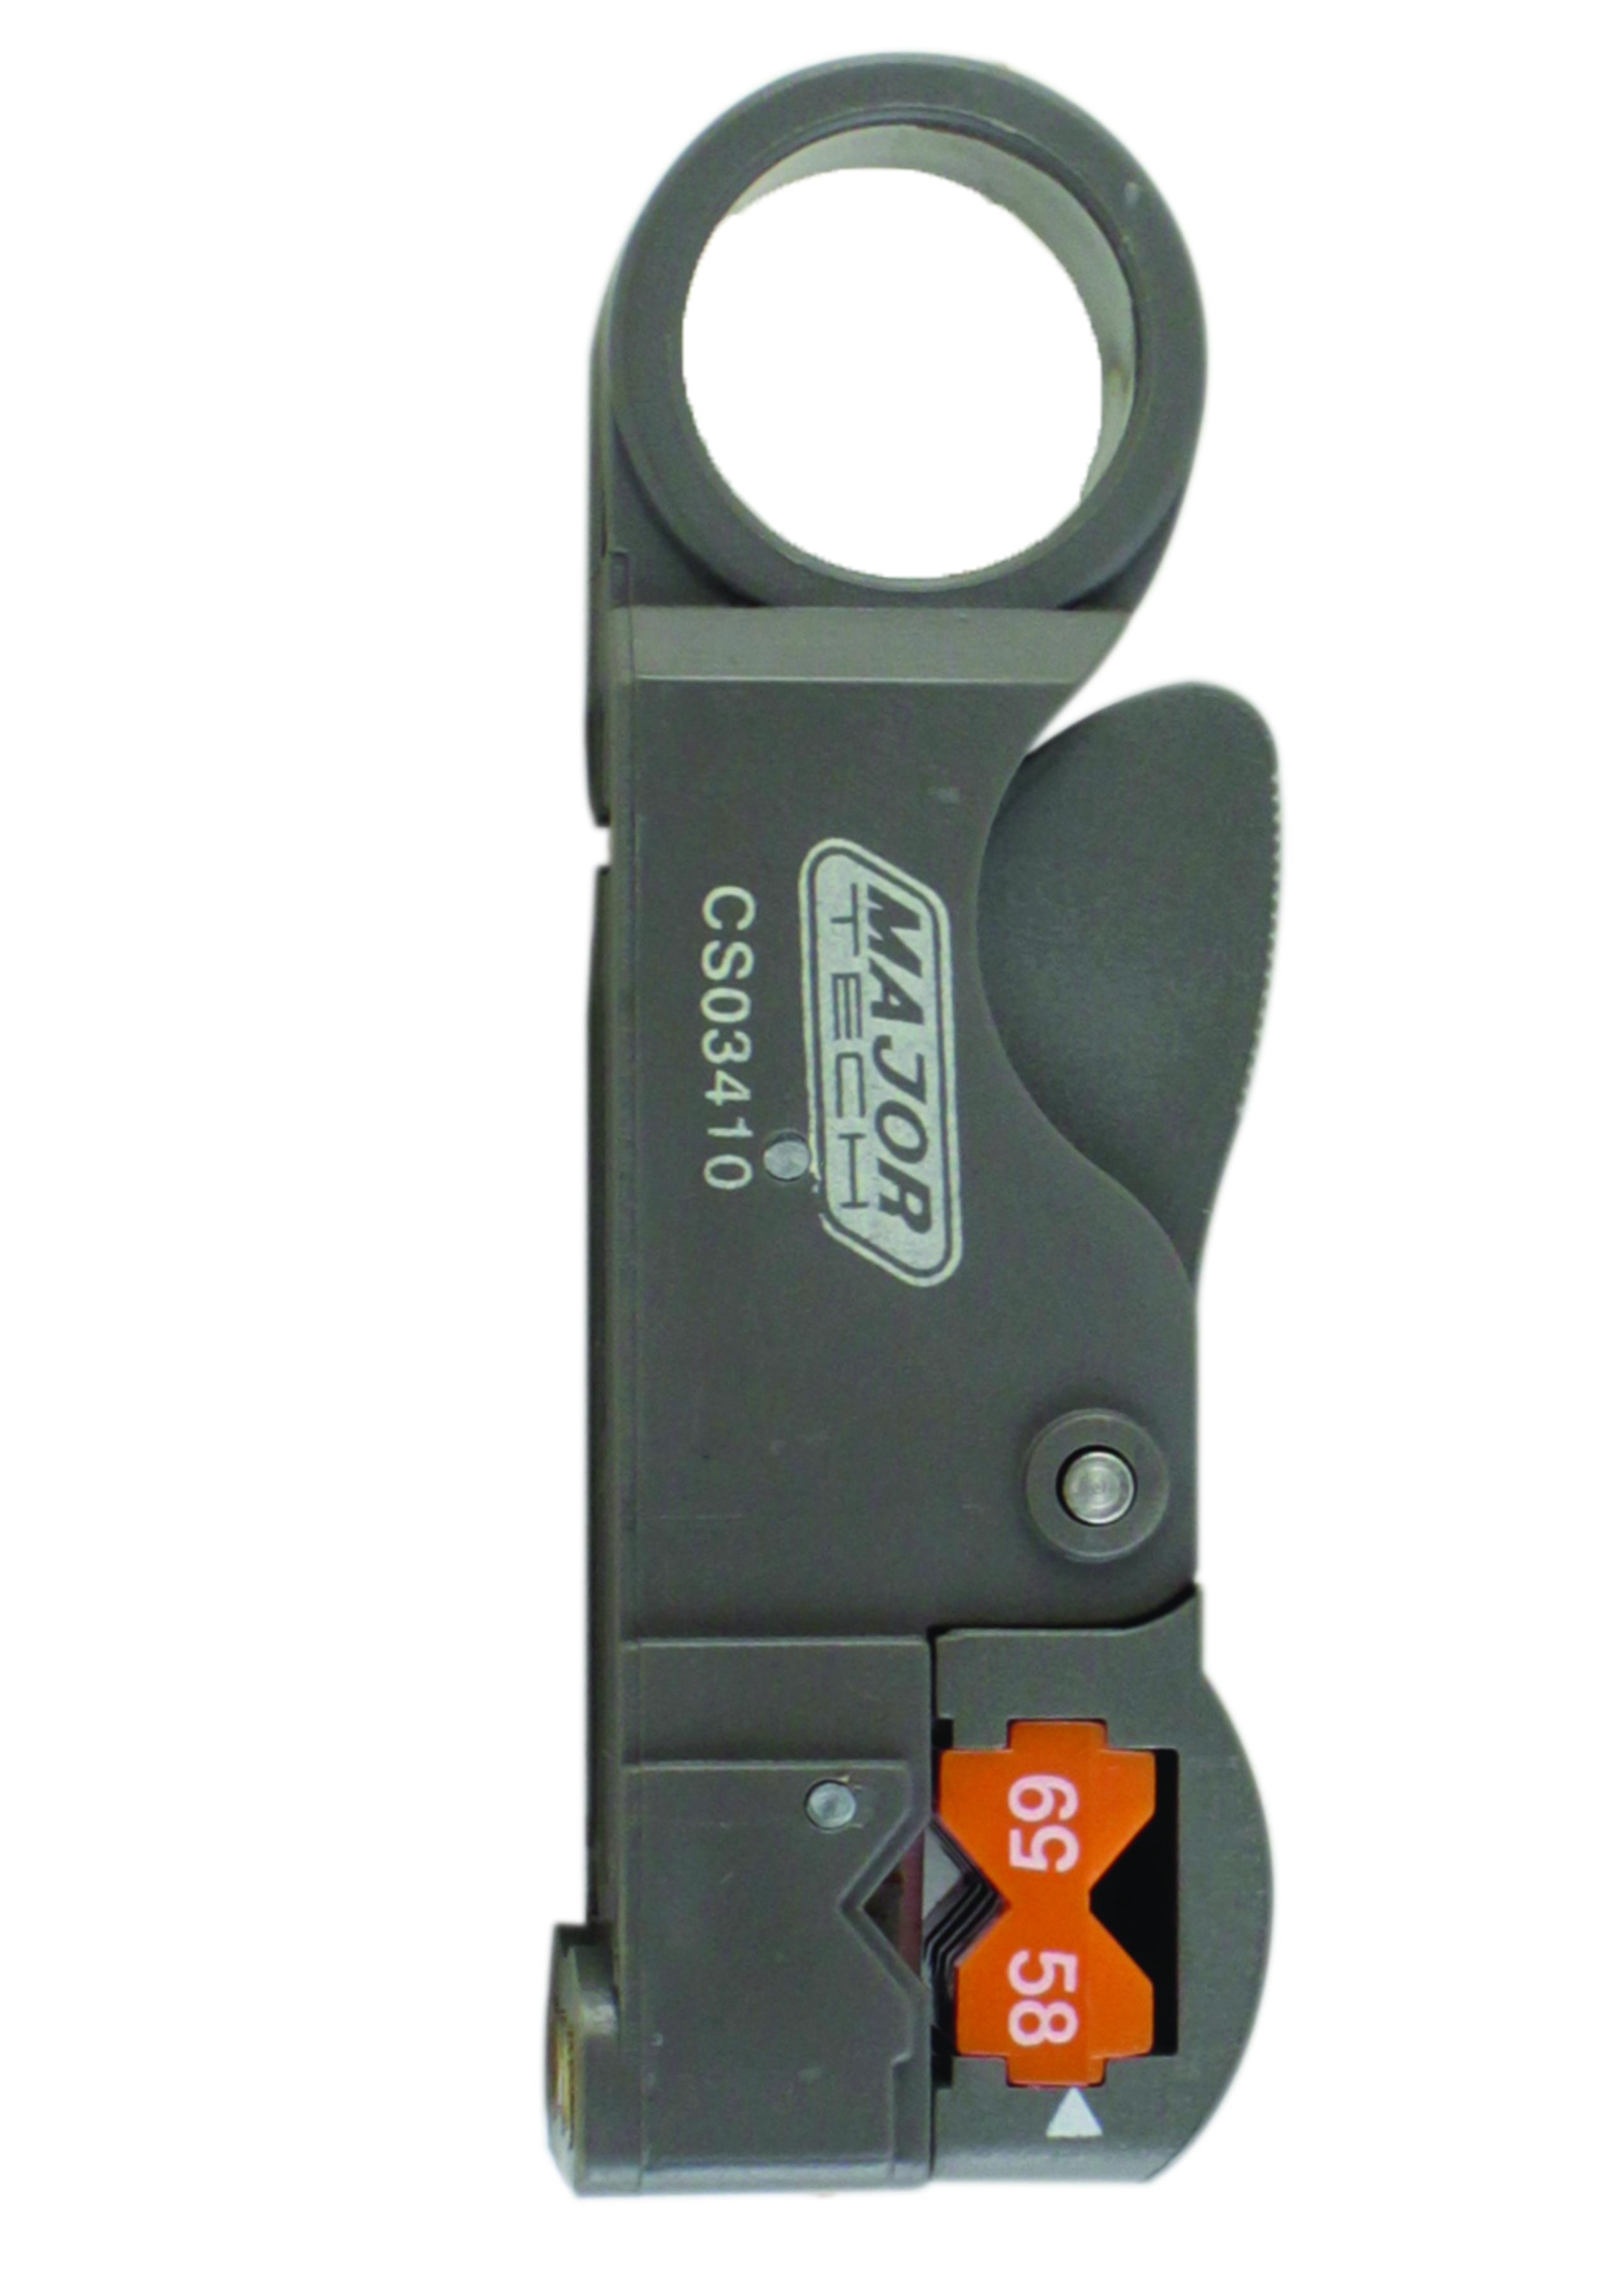 Coaxial Cable Stripper (CS03410) - Major Tech